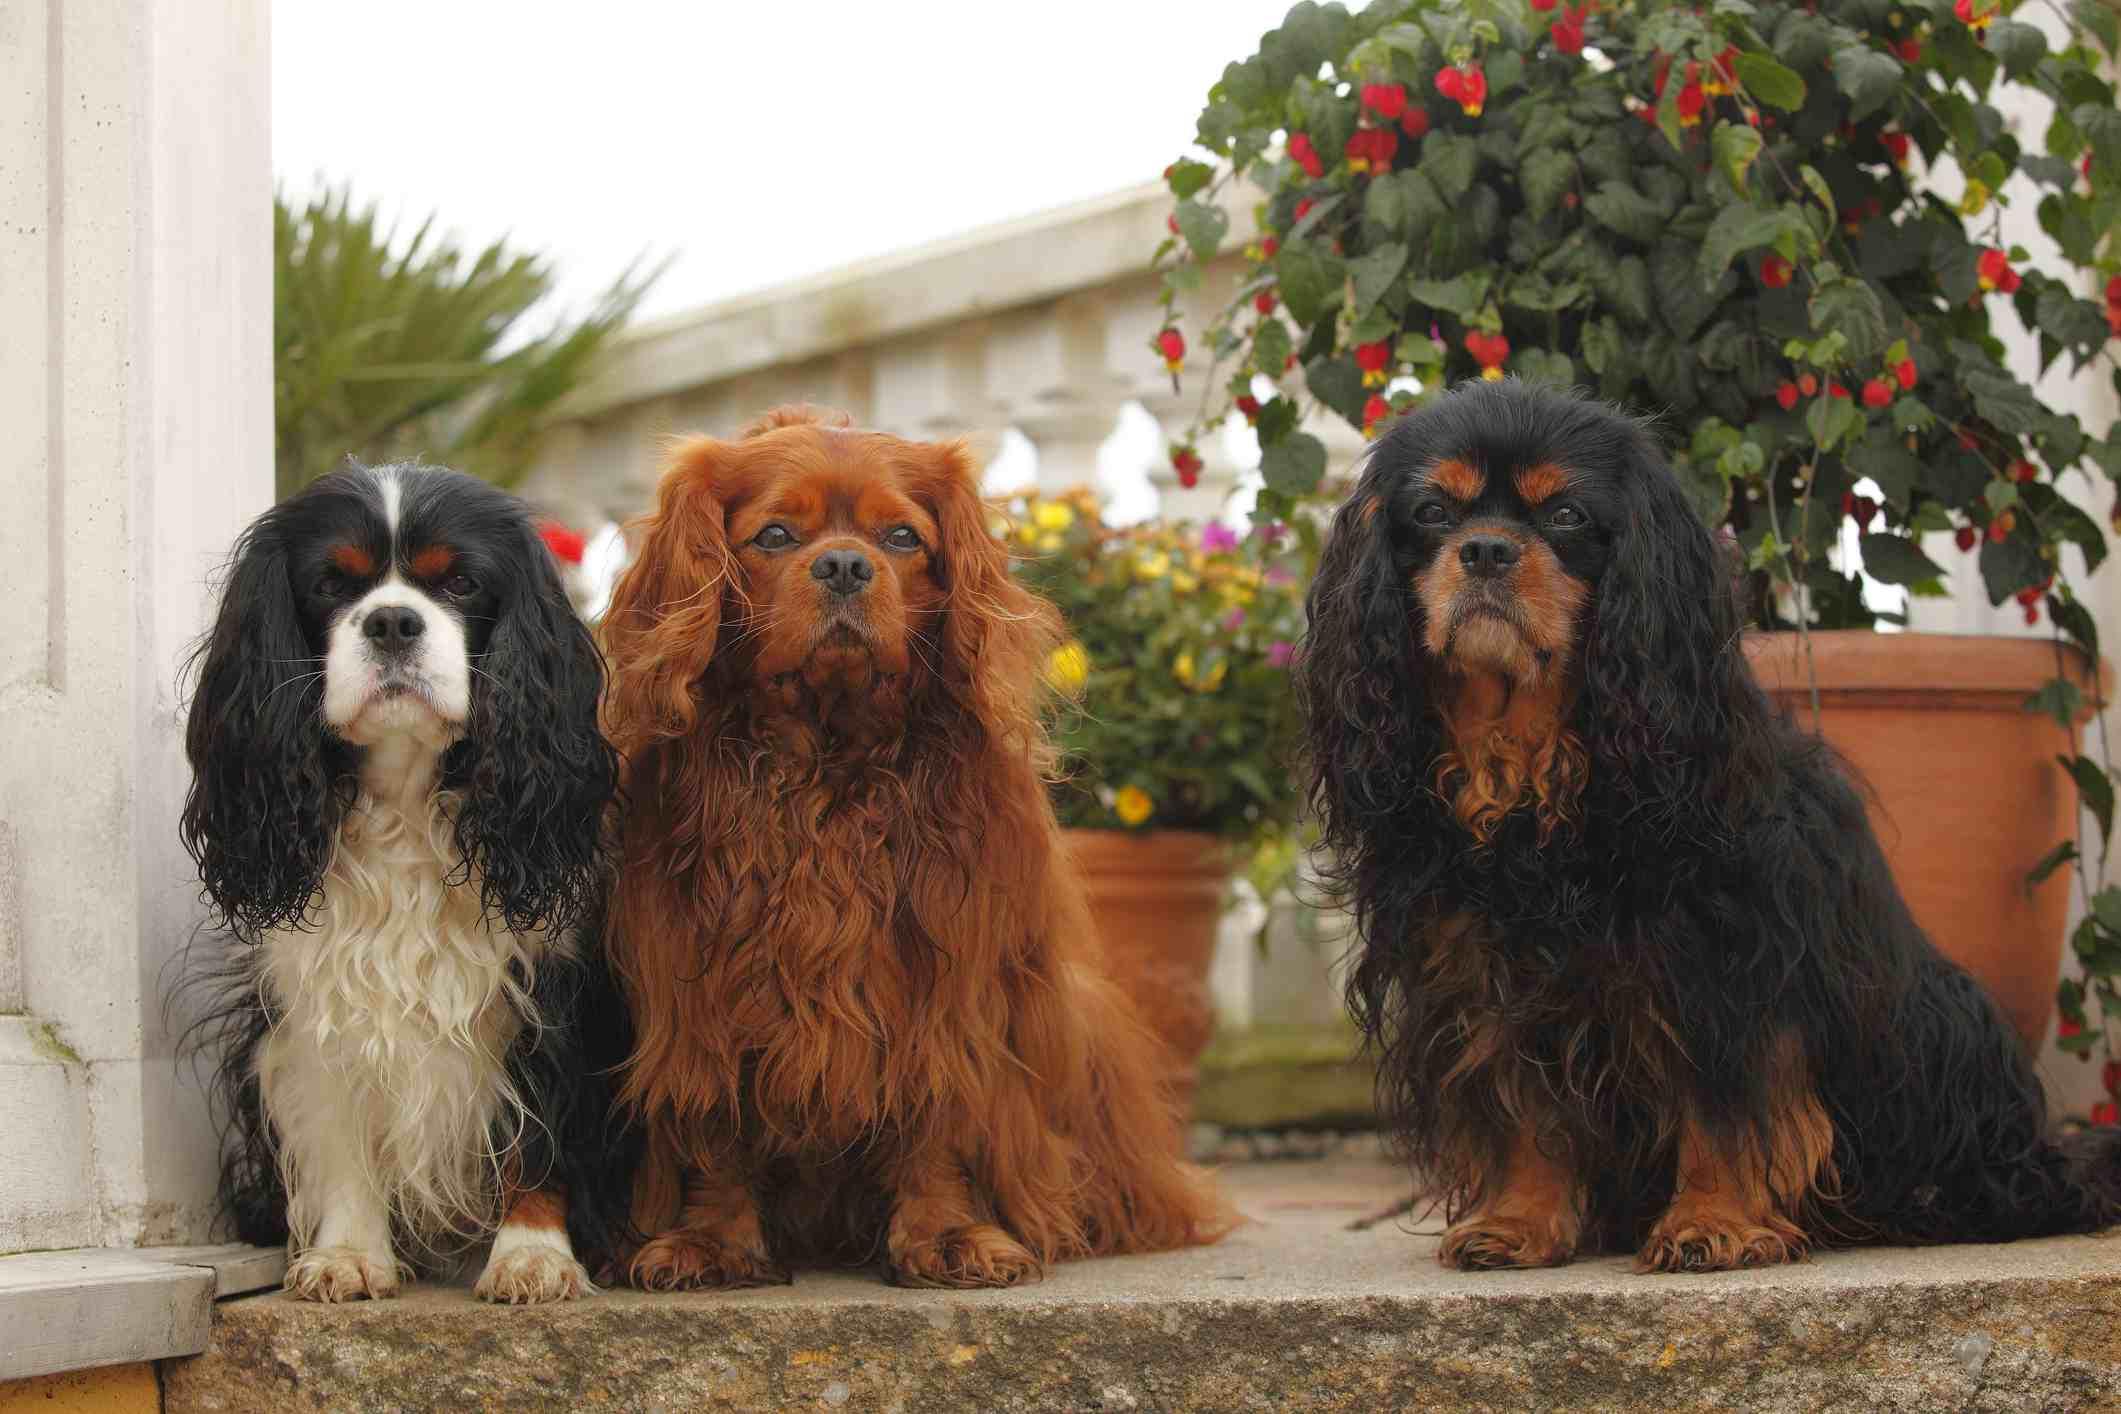 3 Cavalier King Charles Spaniels